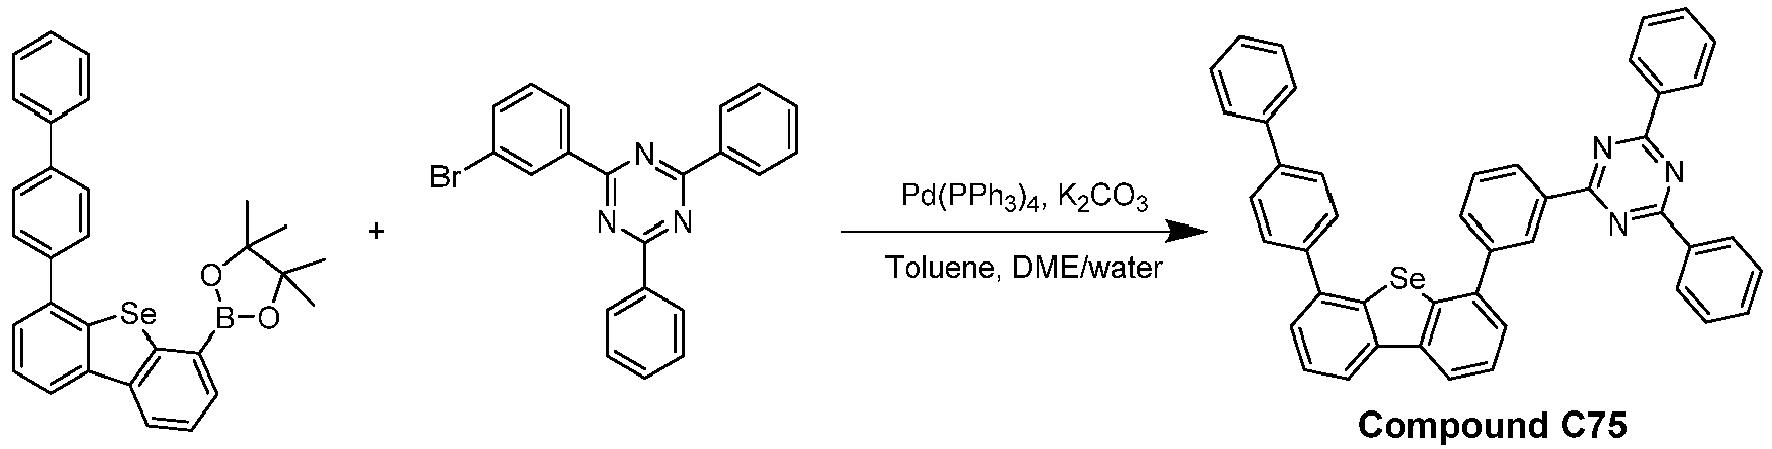 Figure imgb0376